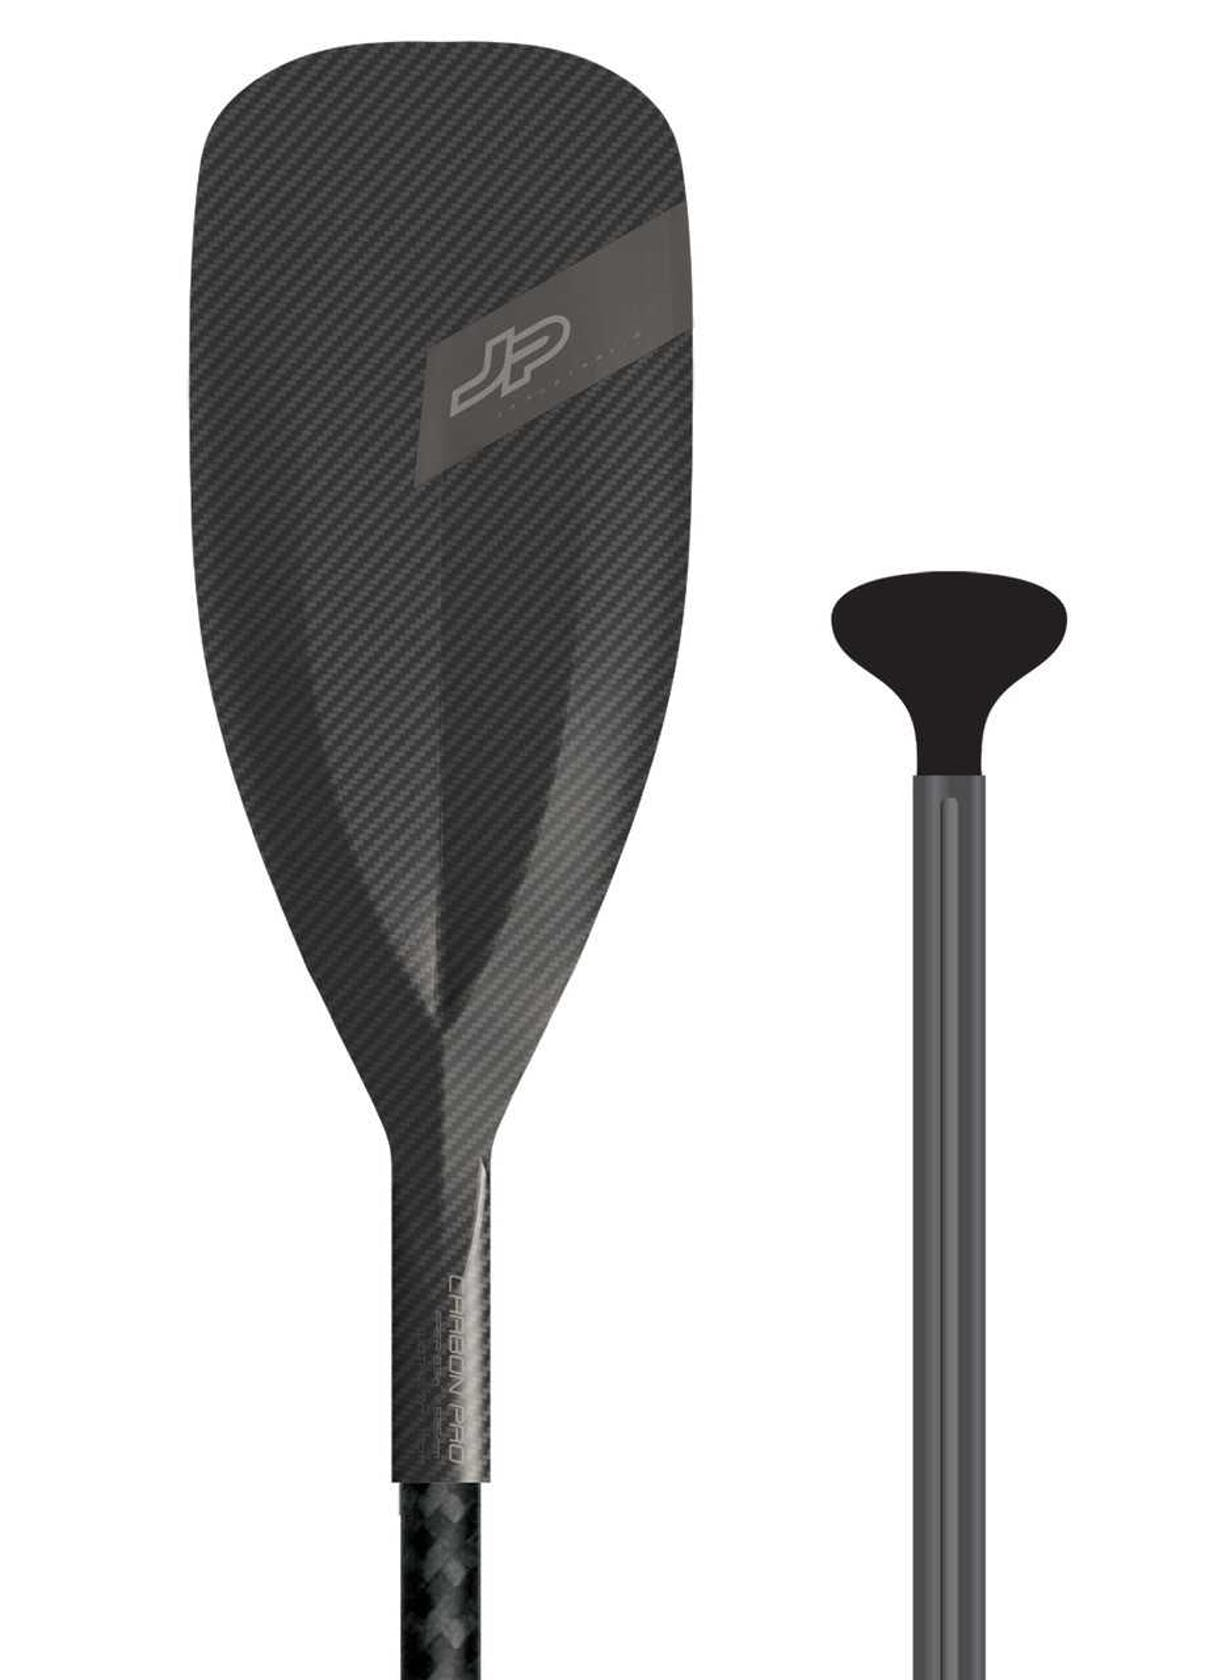 JP SUP CarbonPRO Paddel 2pc 2020